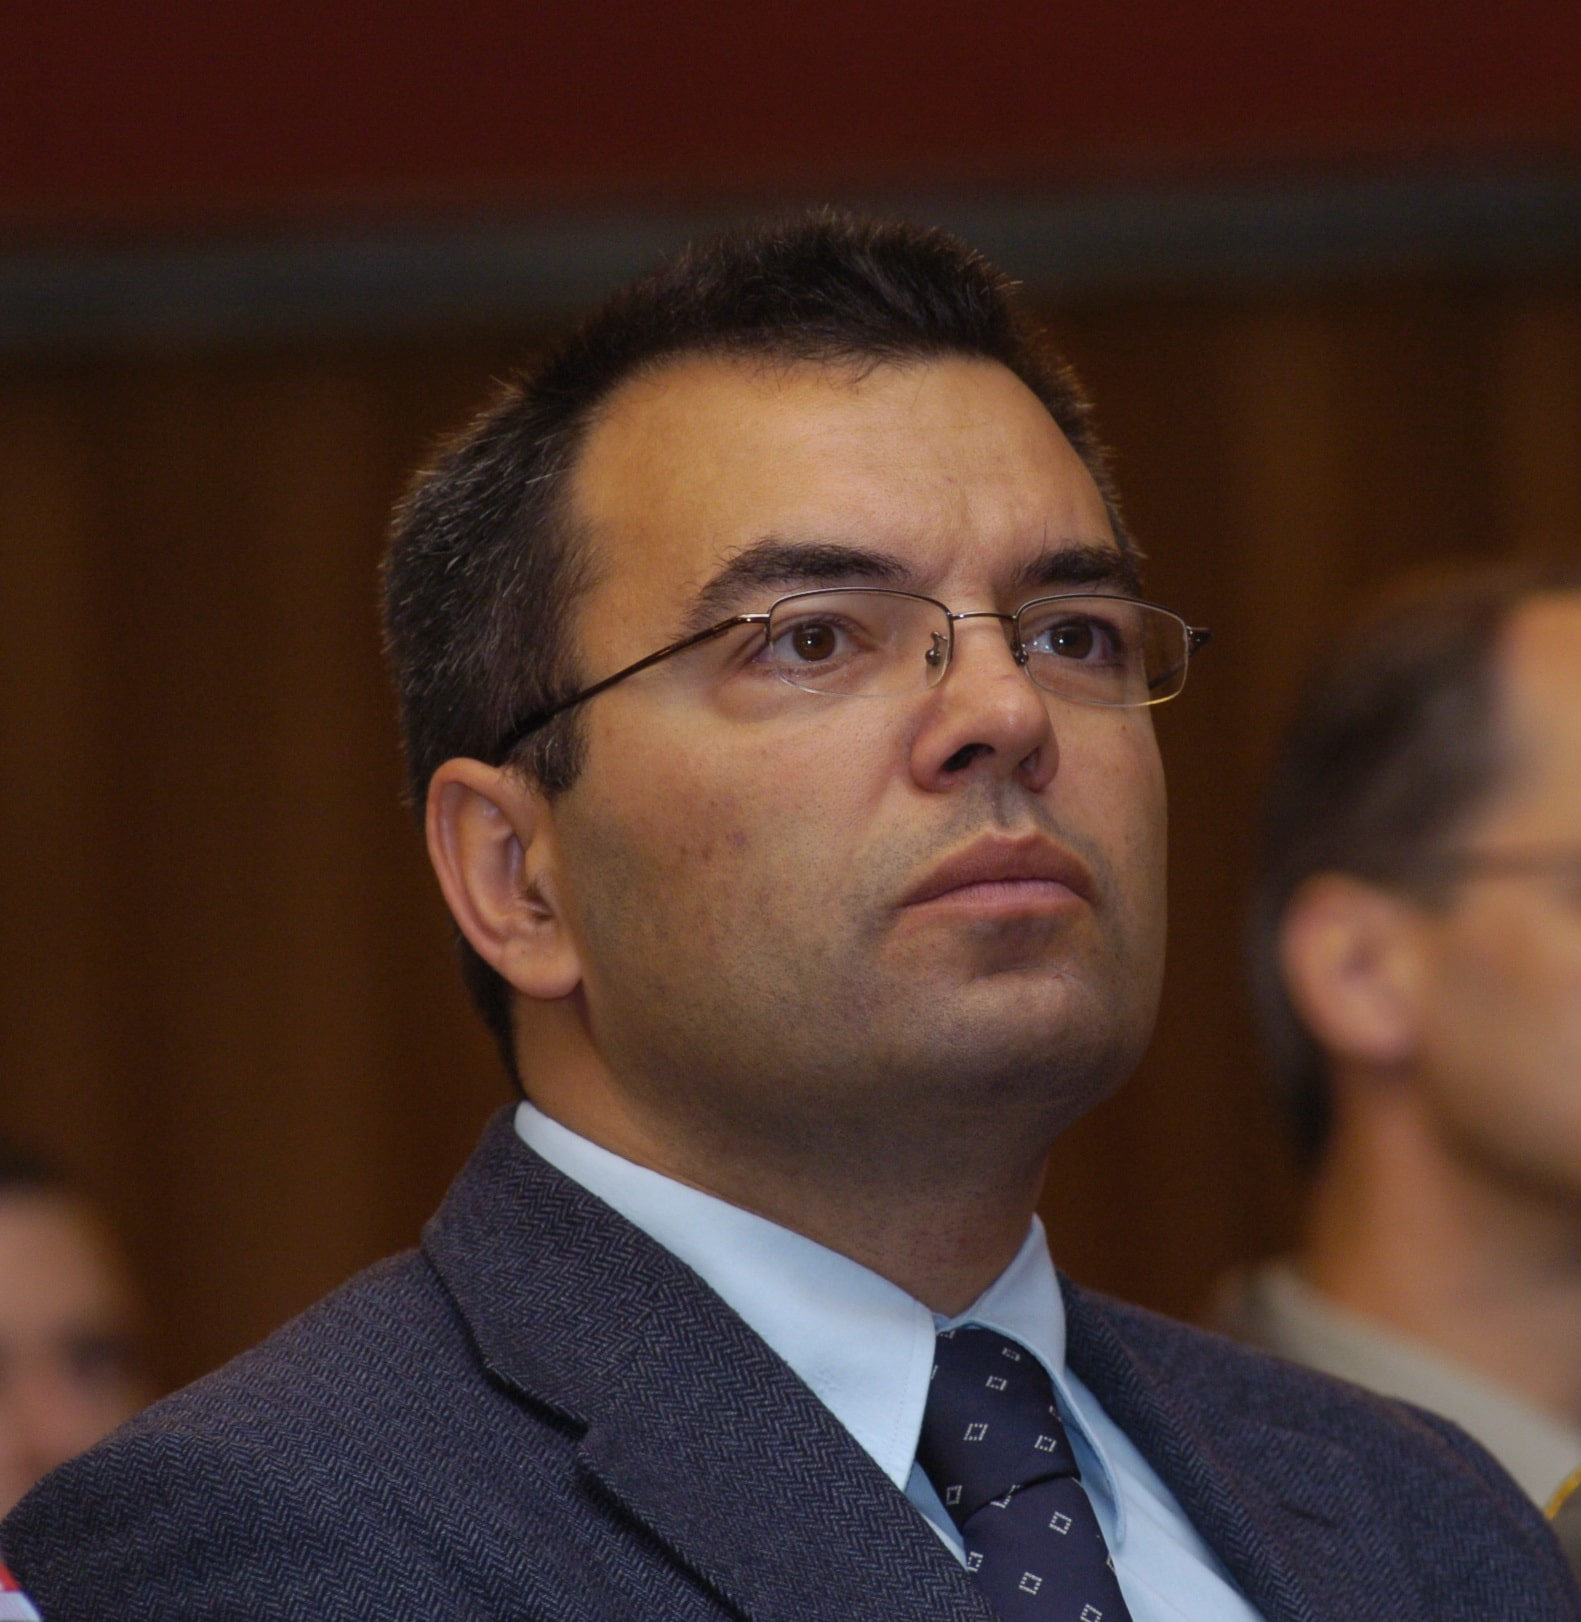 Bojan Dimitrijevic, author